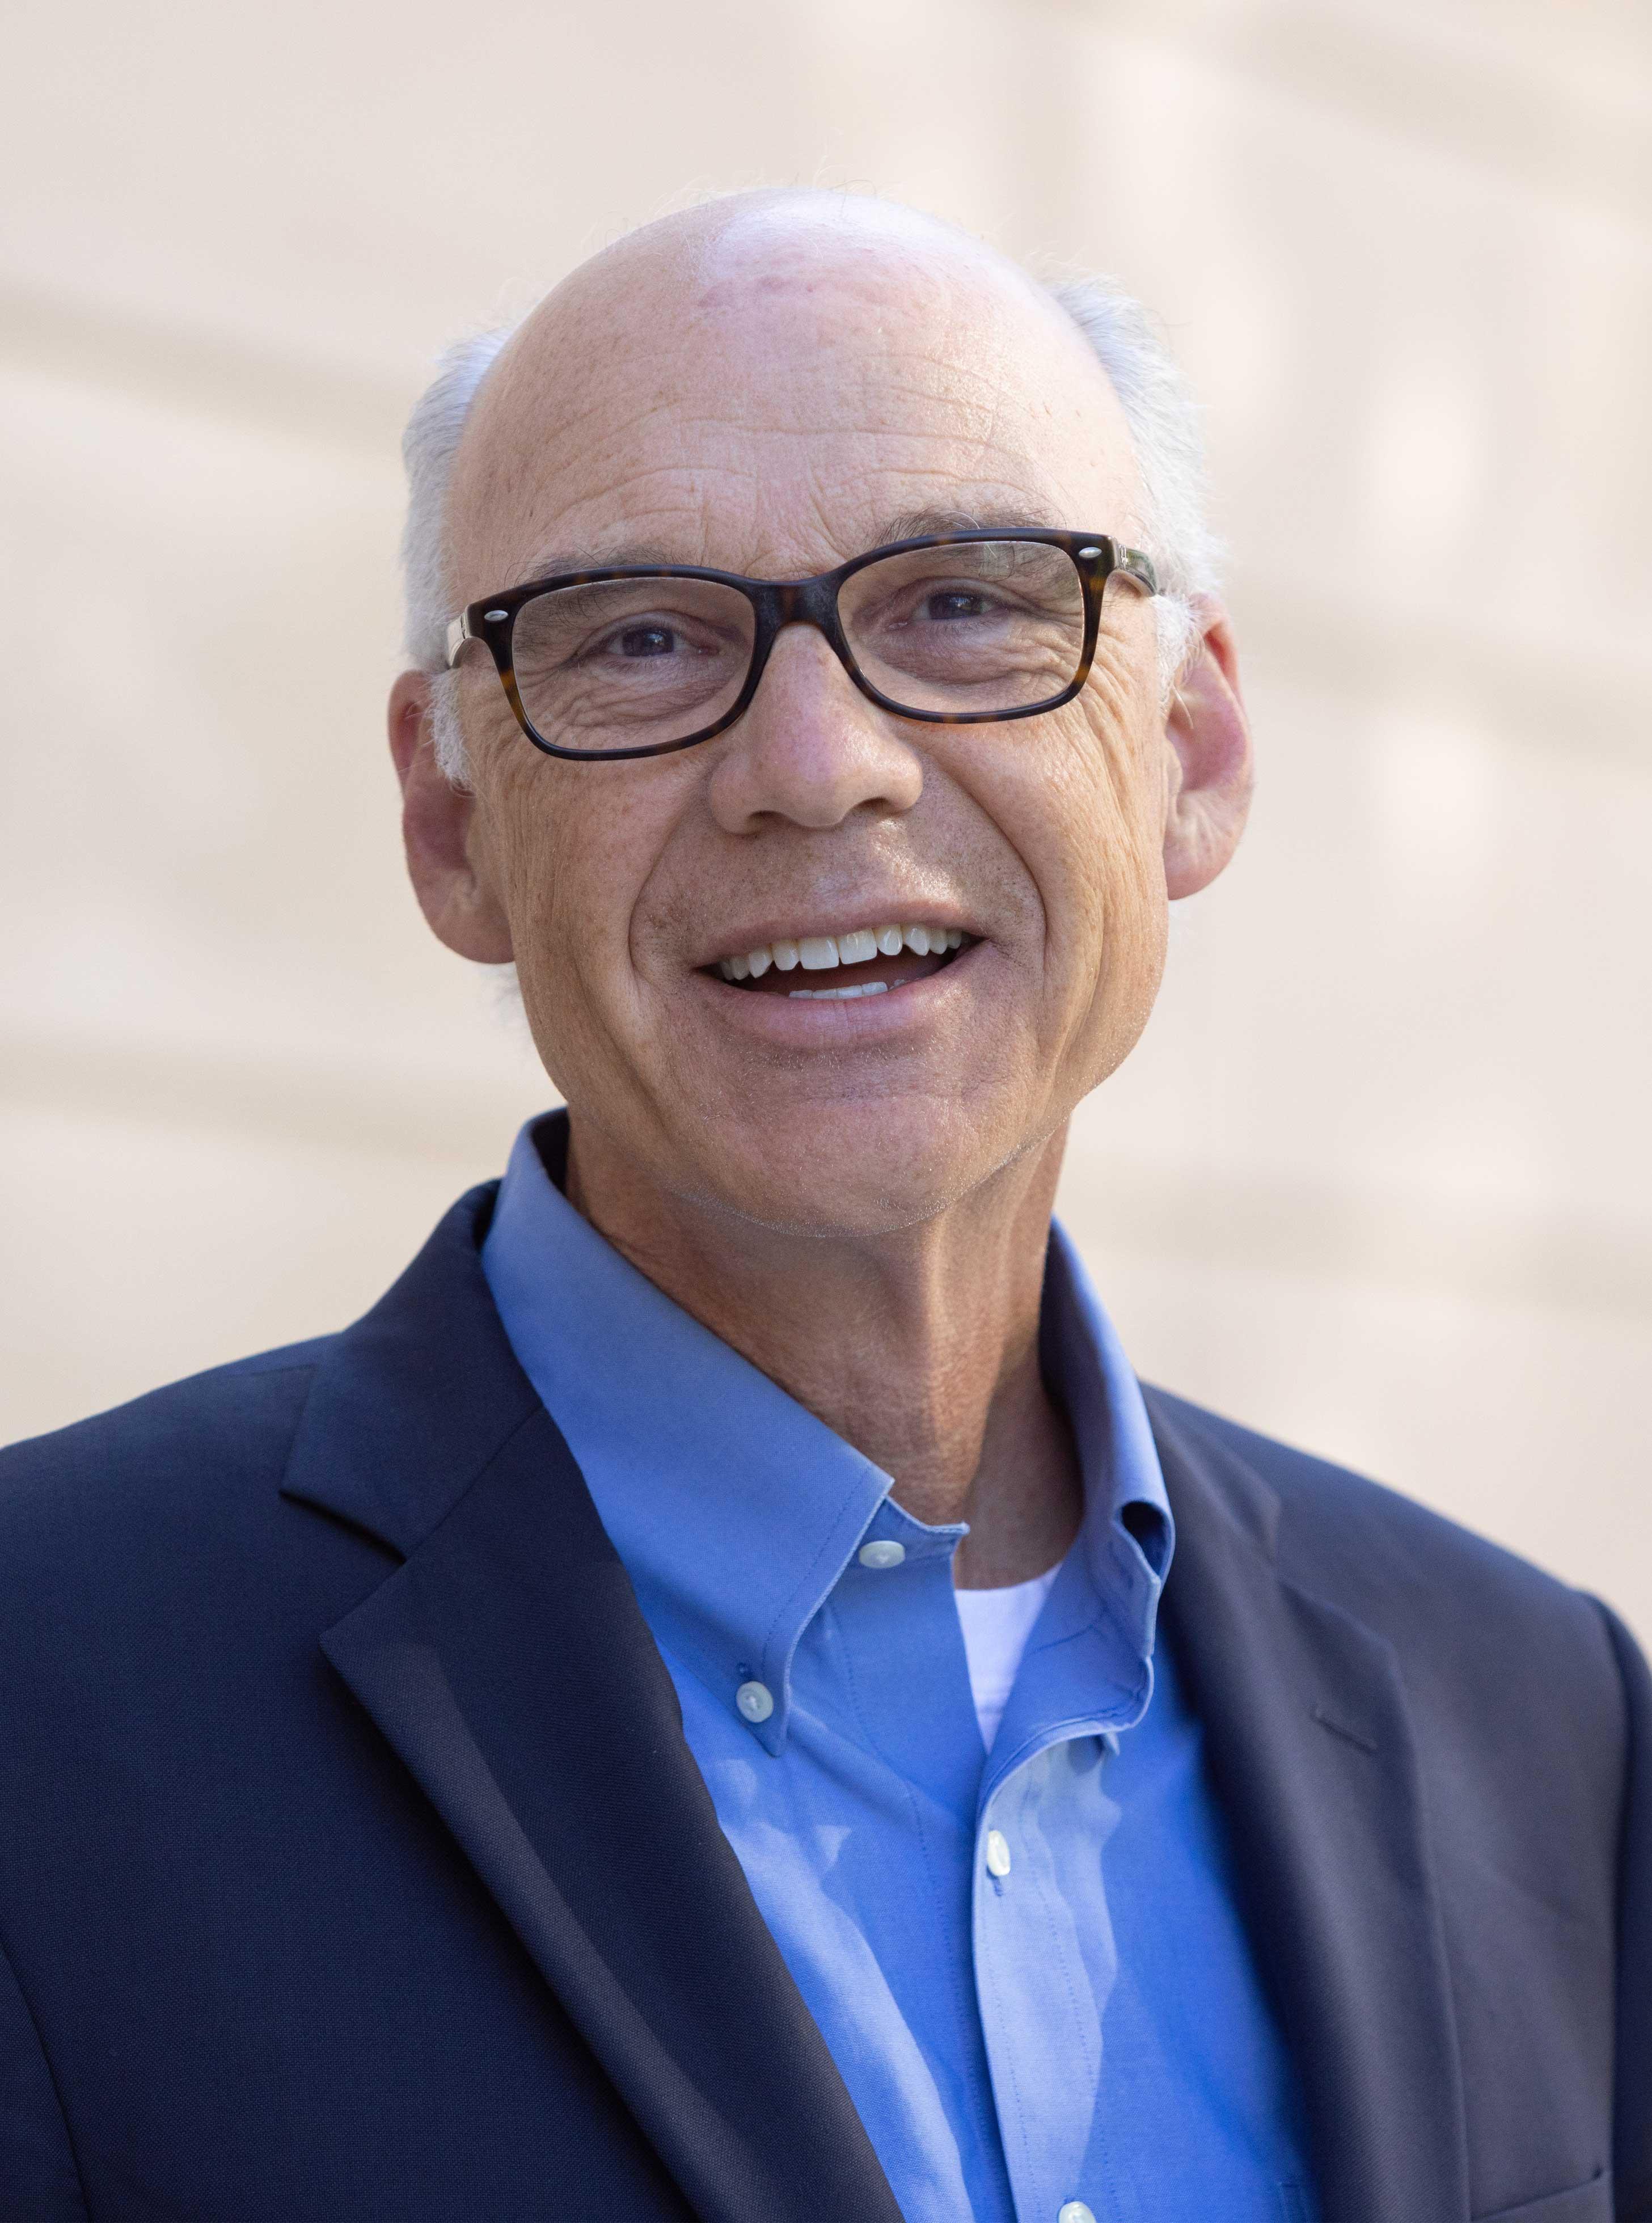 GREGORY D. BUNCH ADJUNCT PROFESSOR OF ENTREPRENEURSHIP